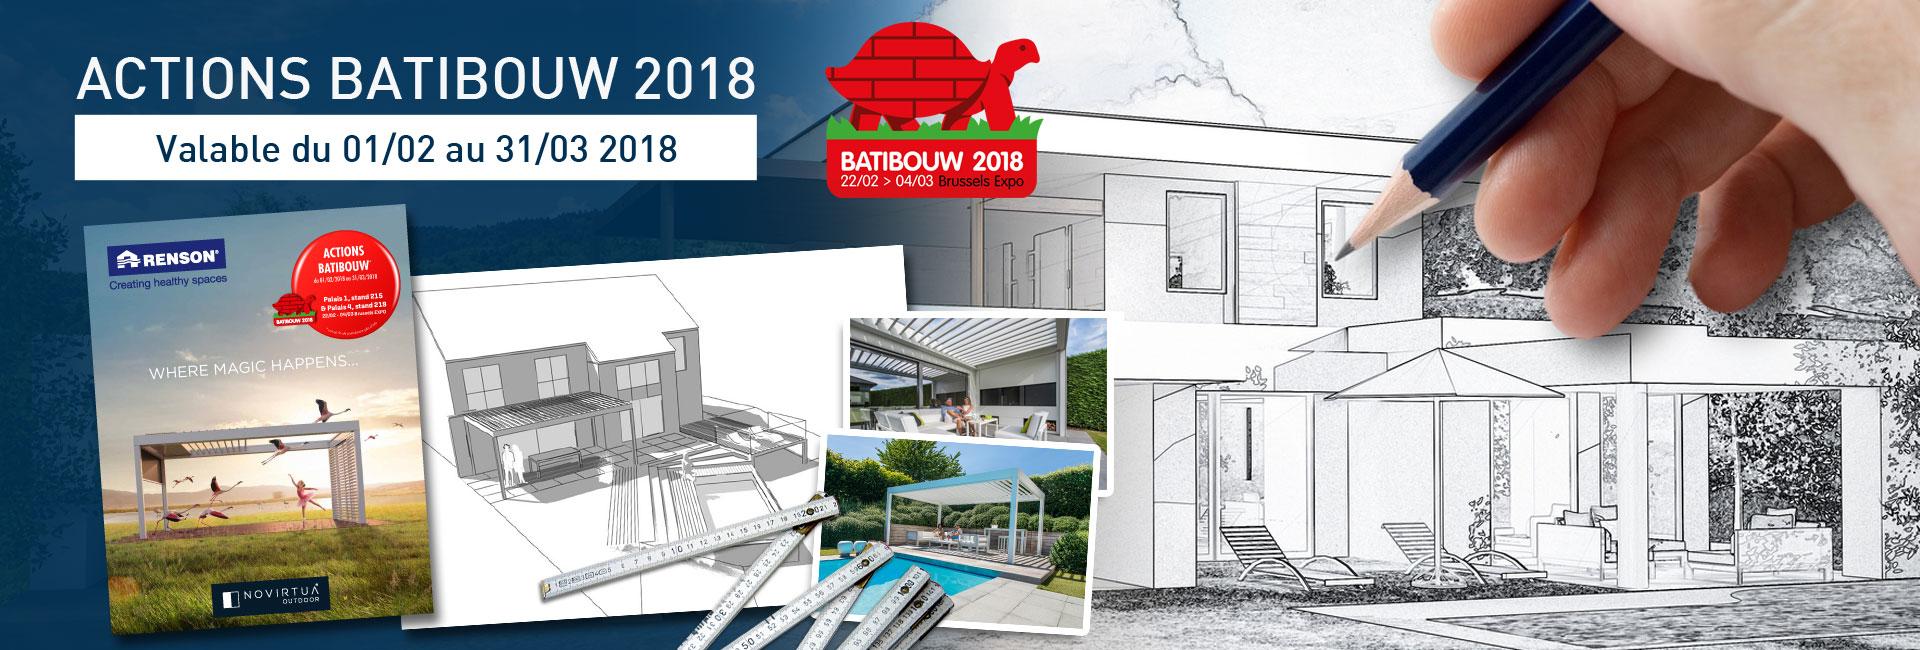 Actions Batibouw 2018